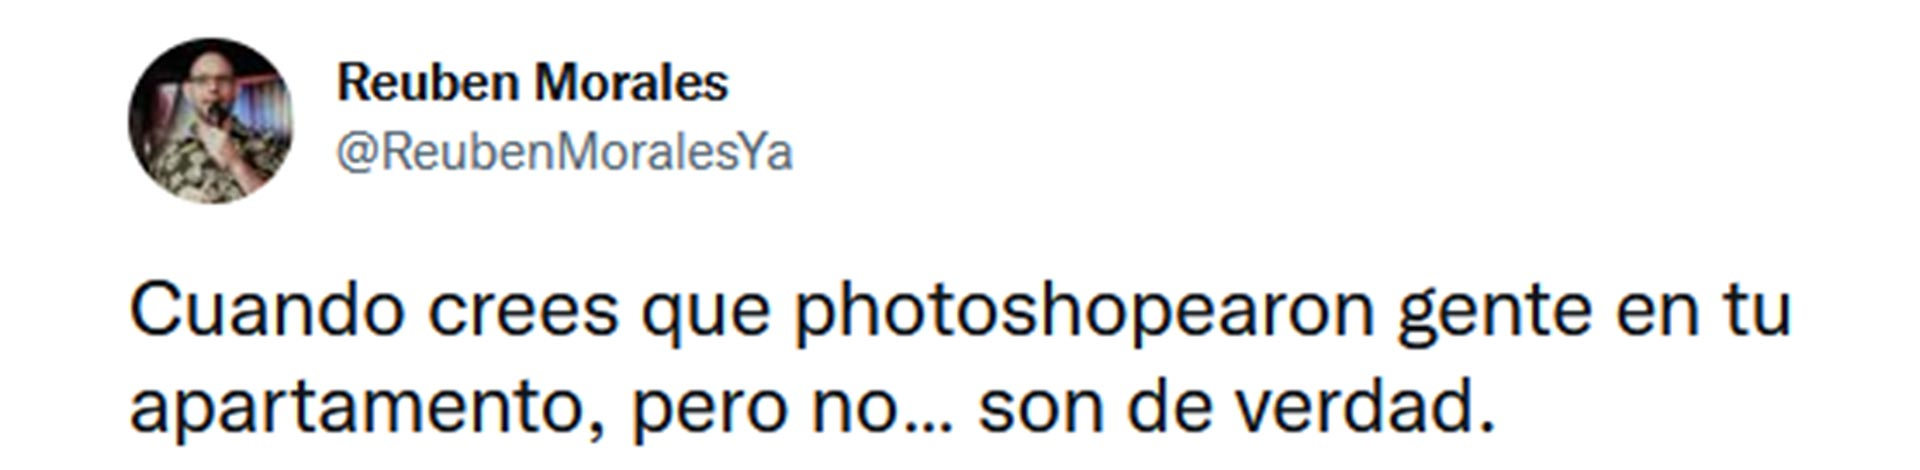 La denuncia de Reuben Morales en Twitter